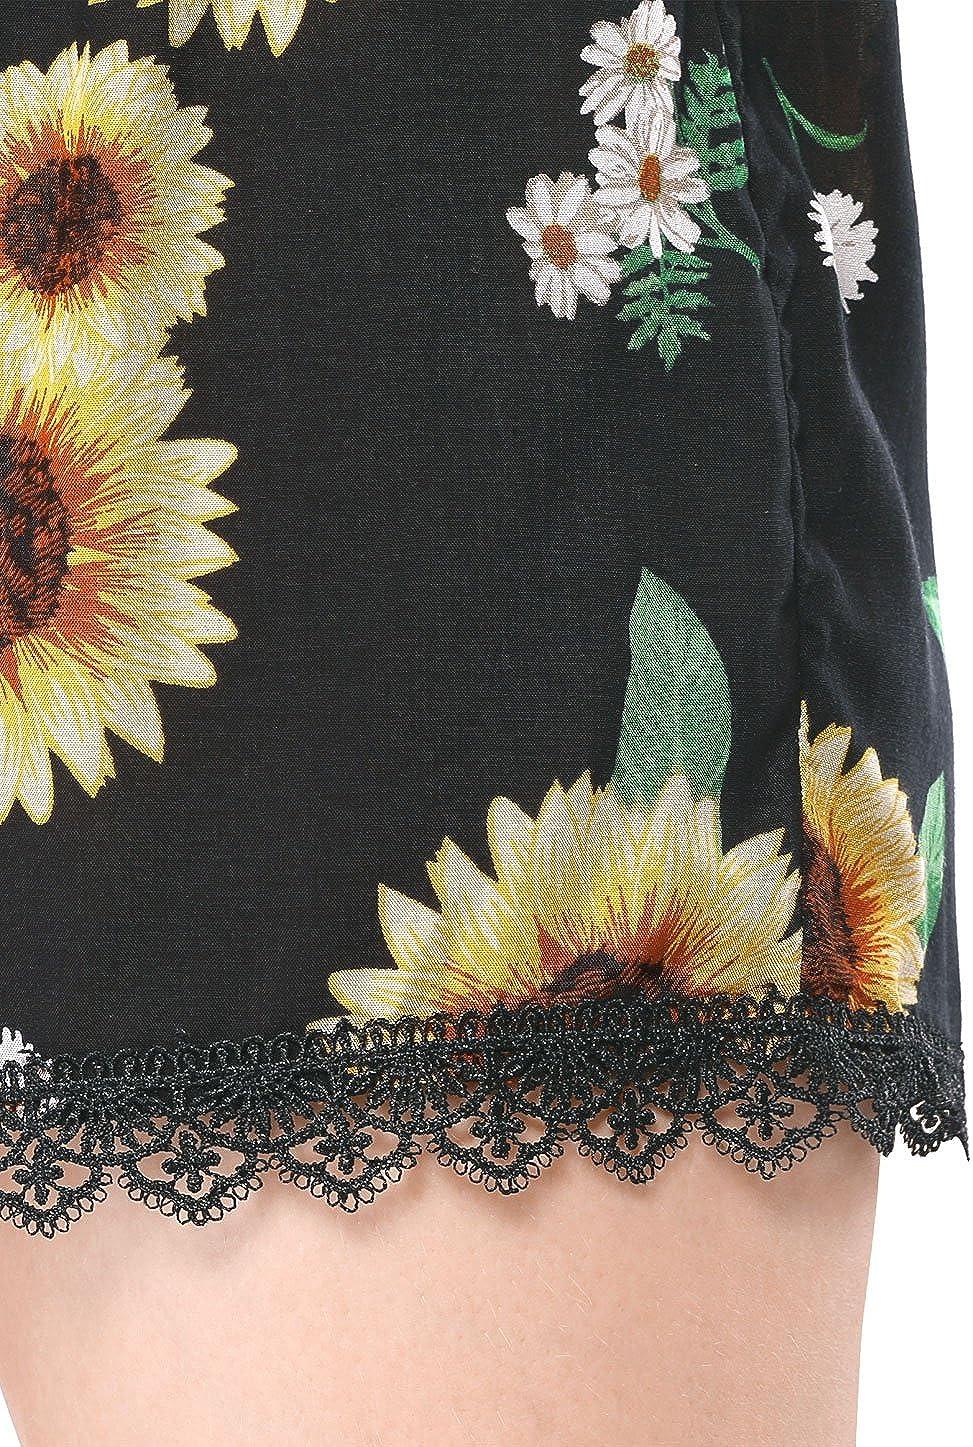 Allegra K Donne Pantaloncini Piuma Floreale Stampa Pizzo Elastico in Vita Spiaggia Pantaloni